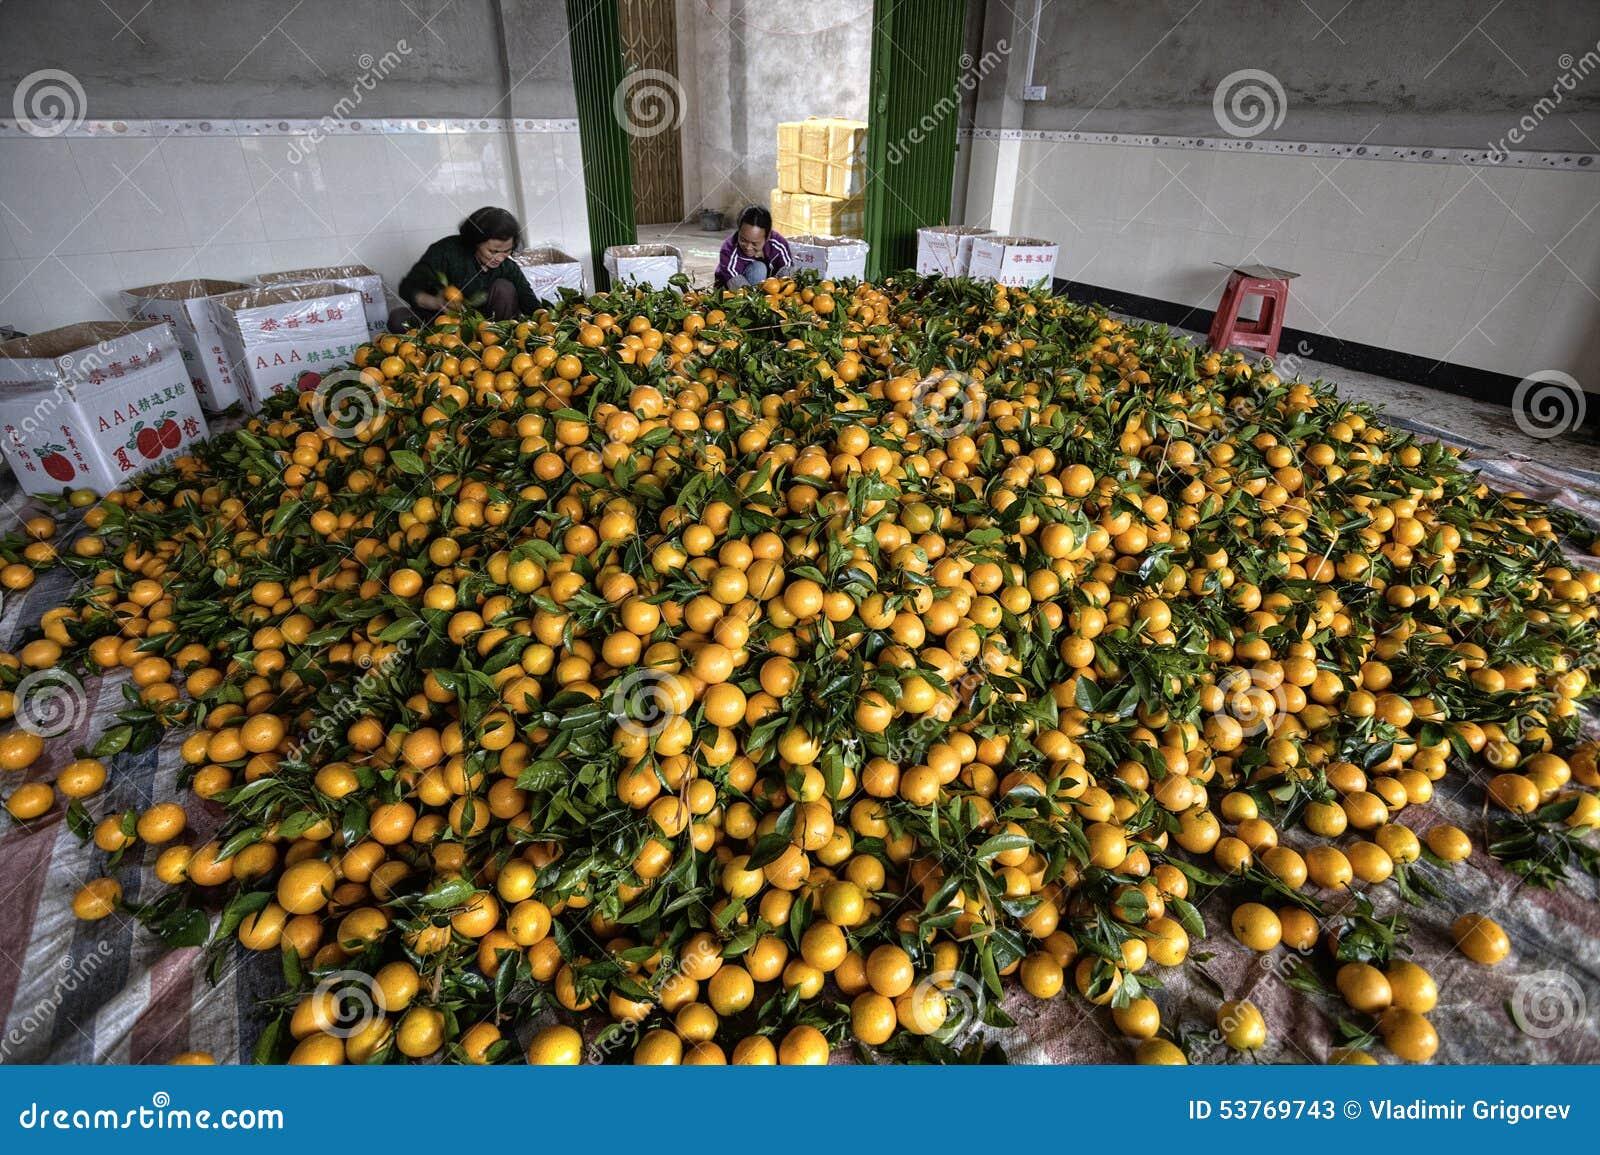 Pile citrus fruits, many new harvest of oranges, women packing